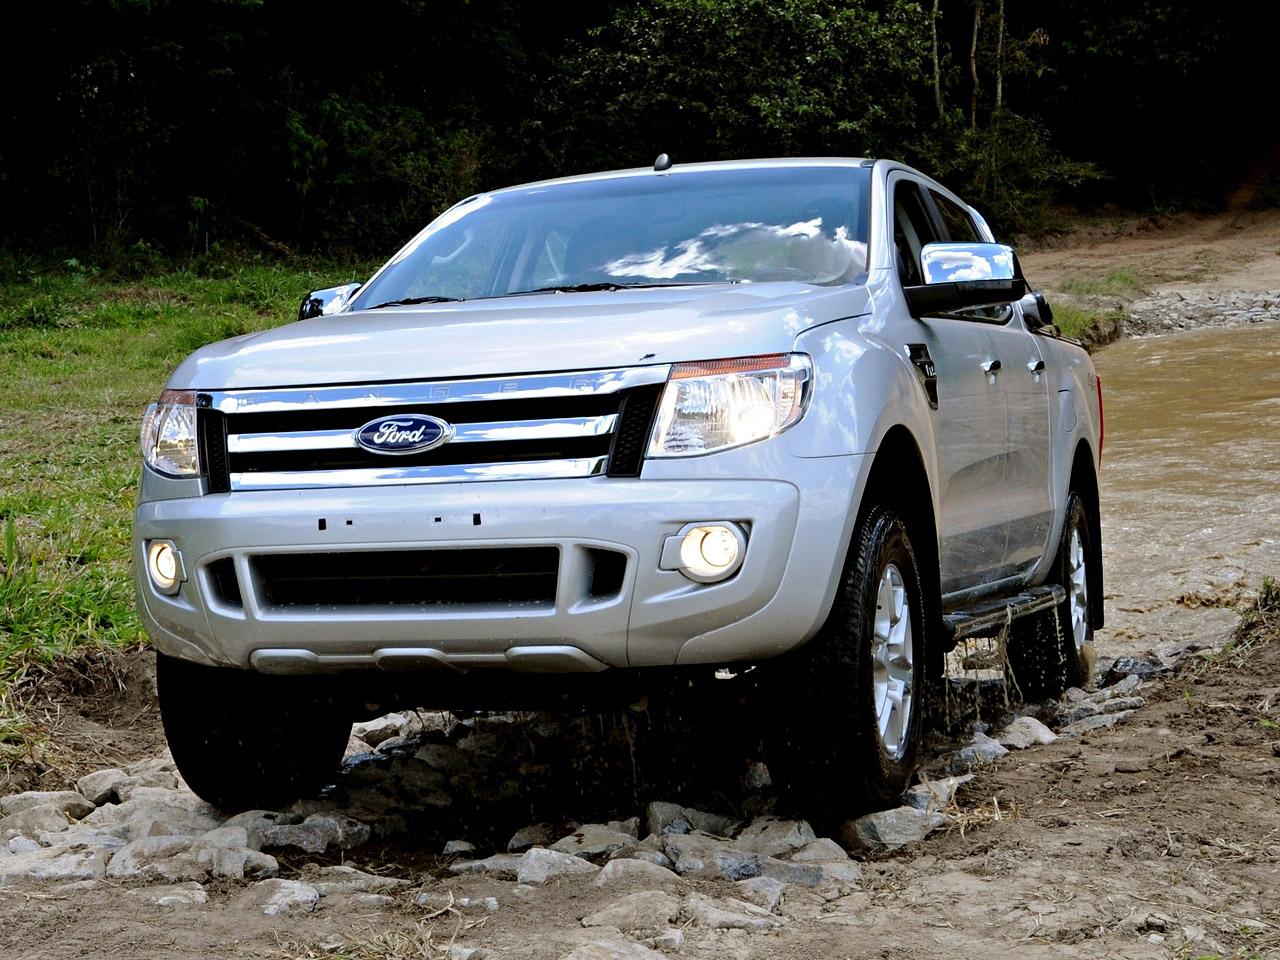 ford ranger 2012 cinza de frente off road